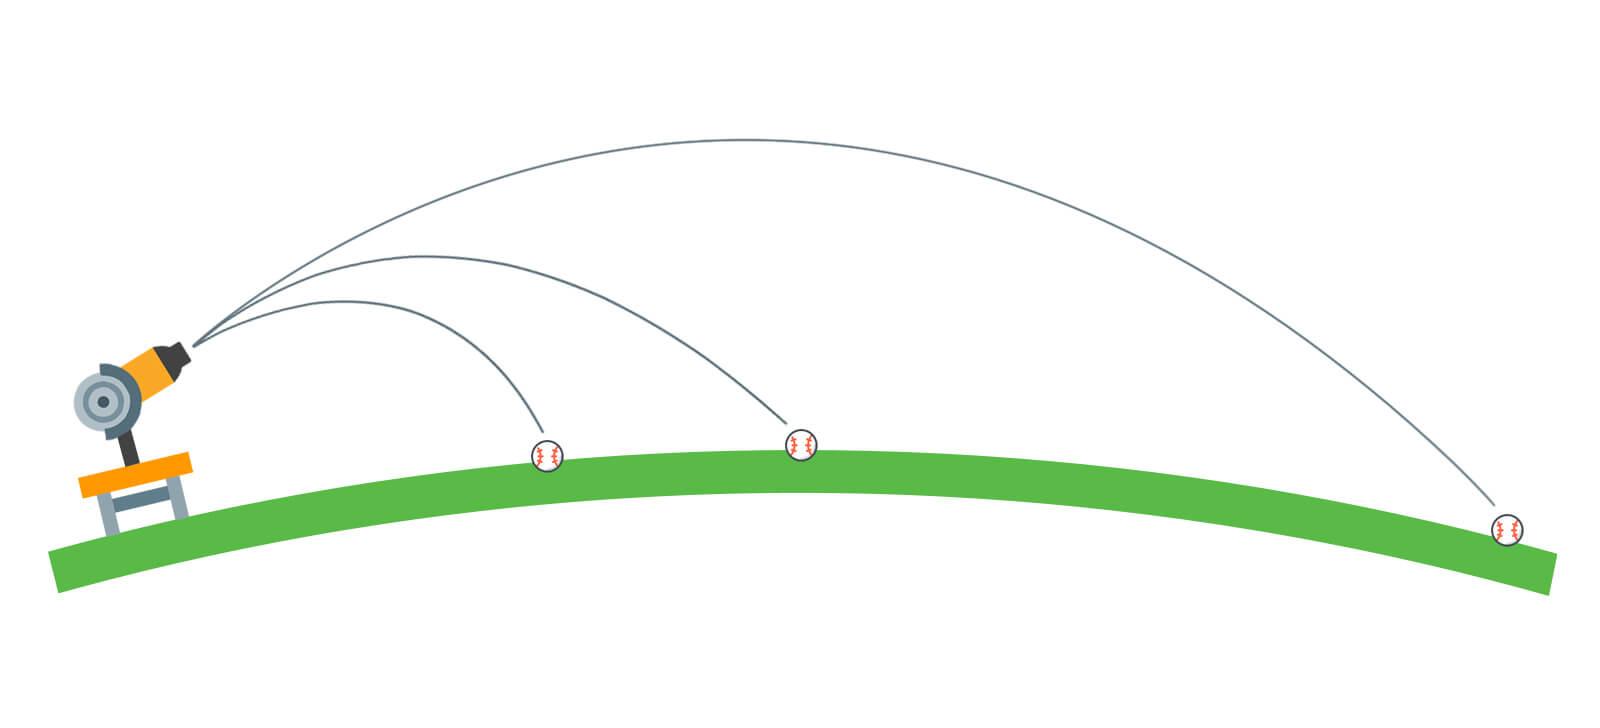 Ball Throw Example 3